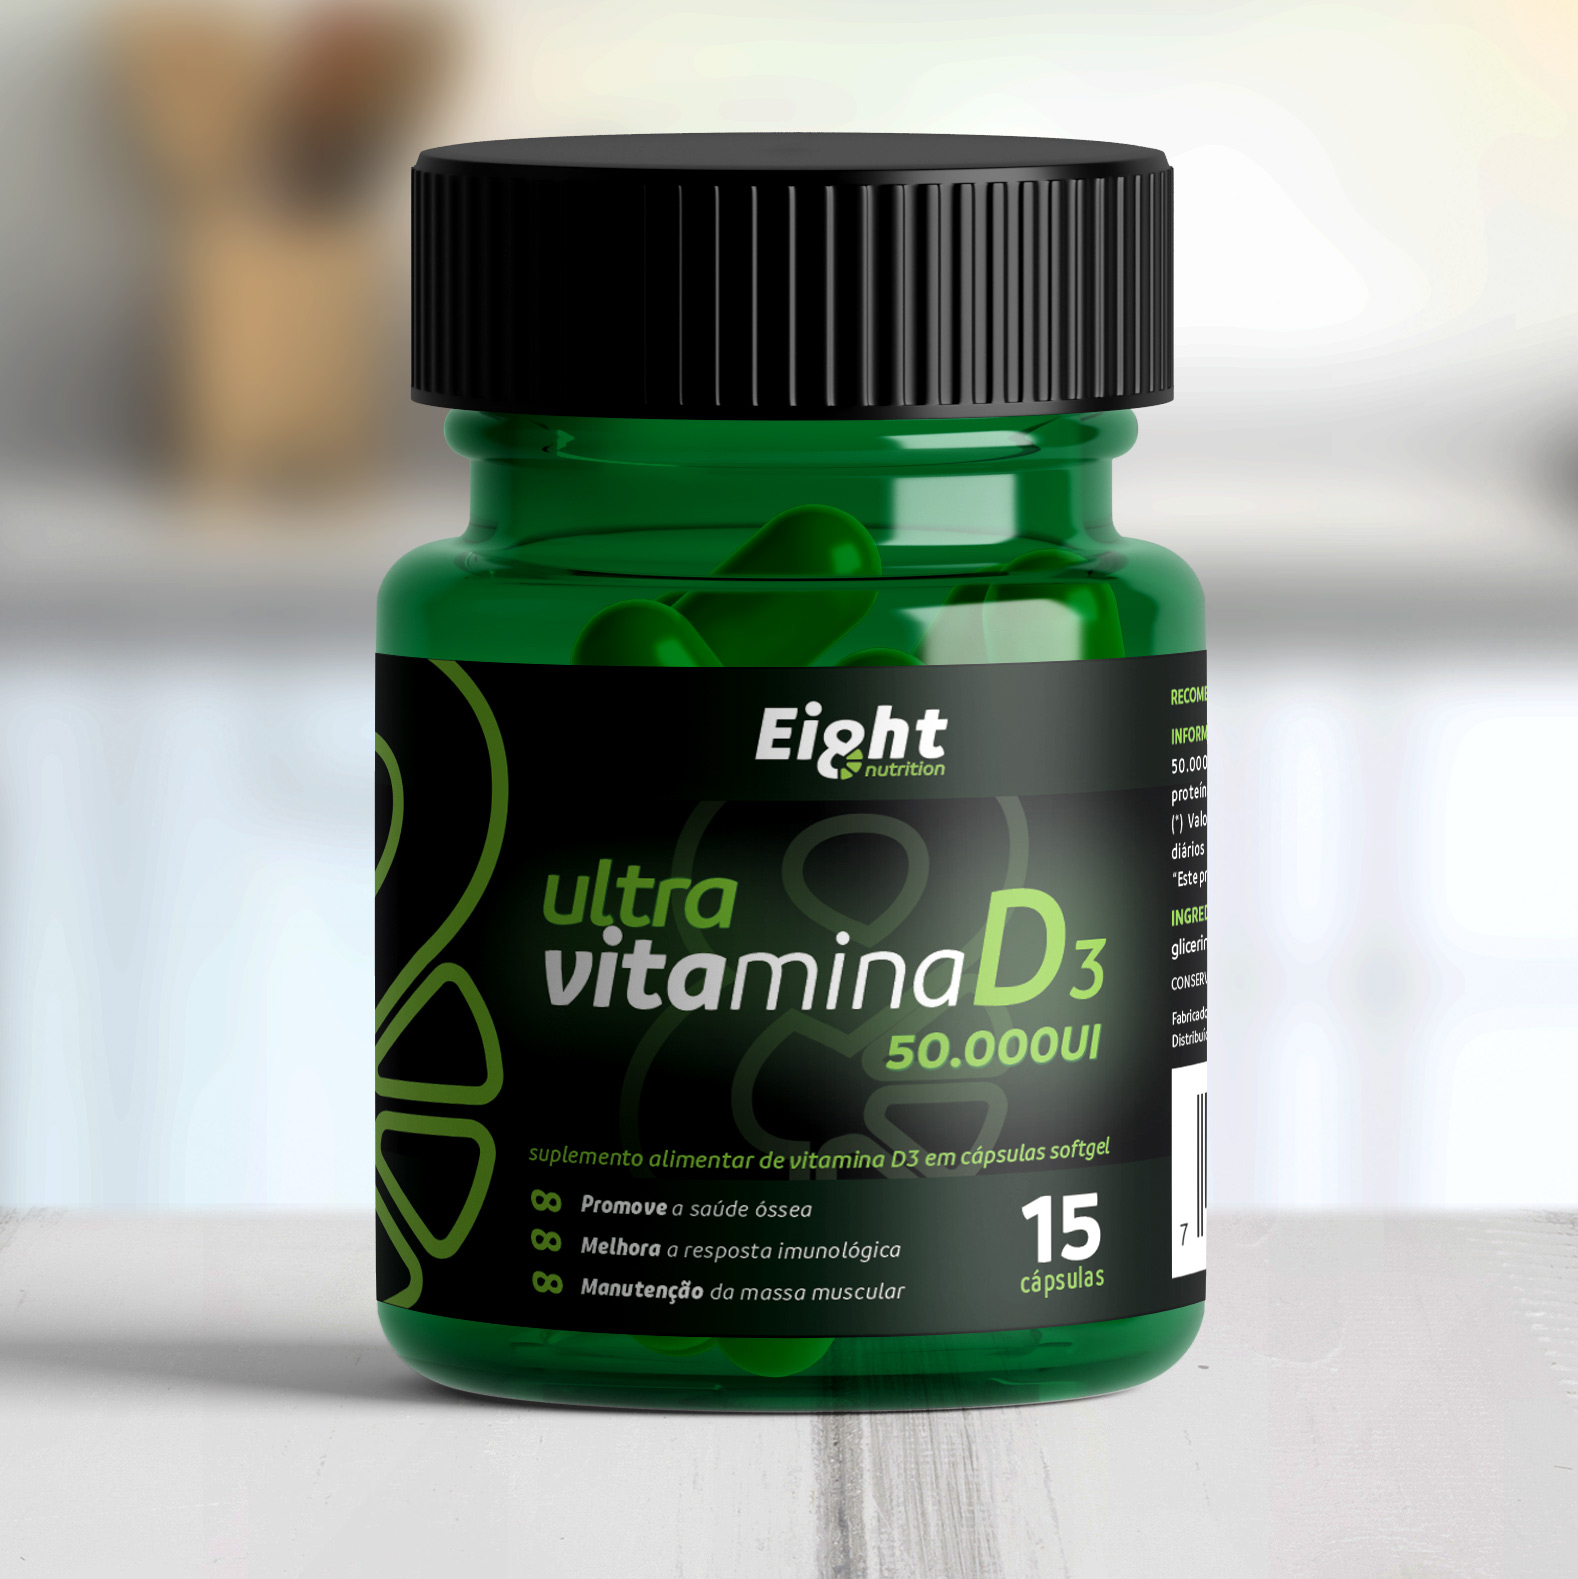 Vitamina D3 ULTRA 50.000UI 15 cápsulas (Eight Nutrition)